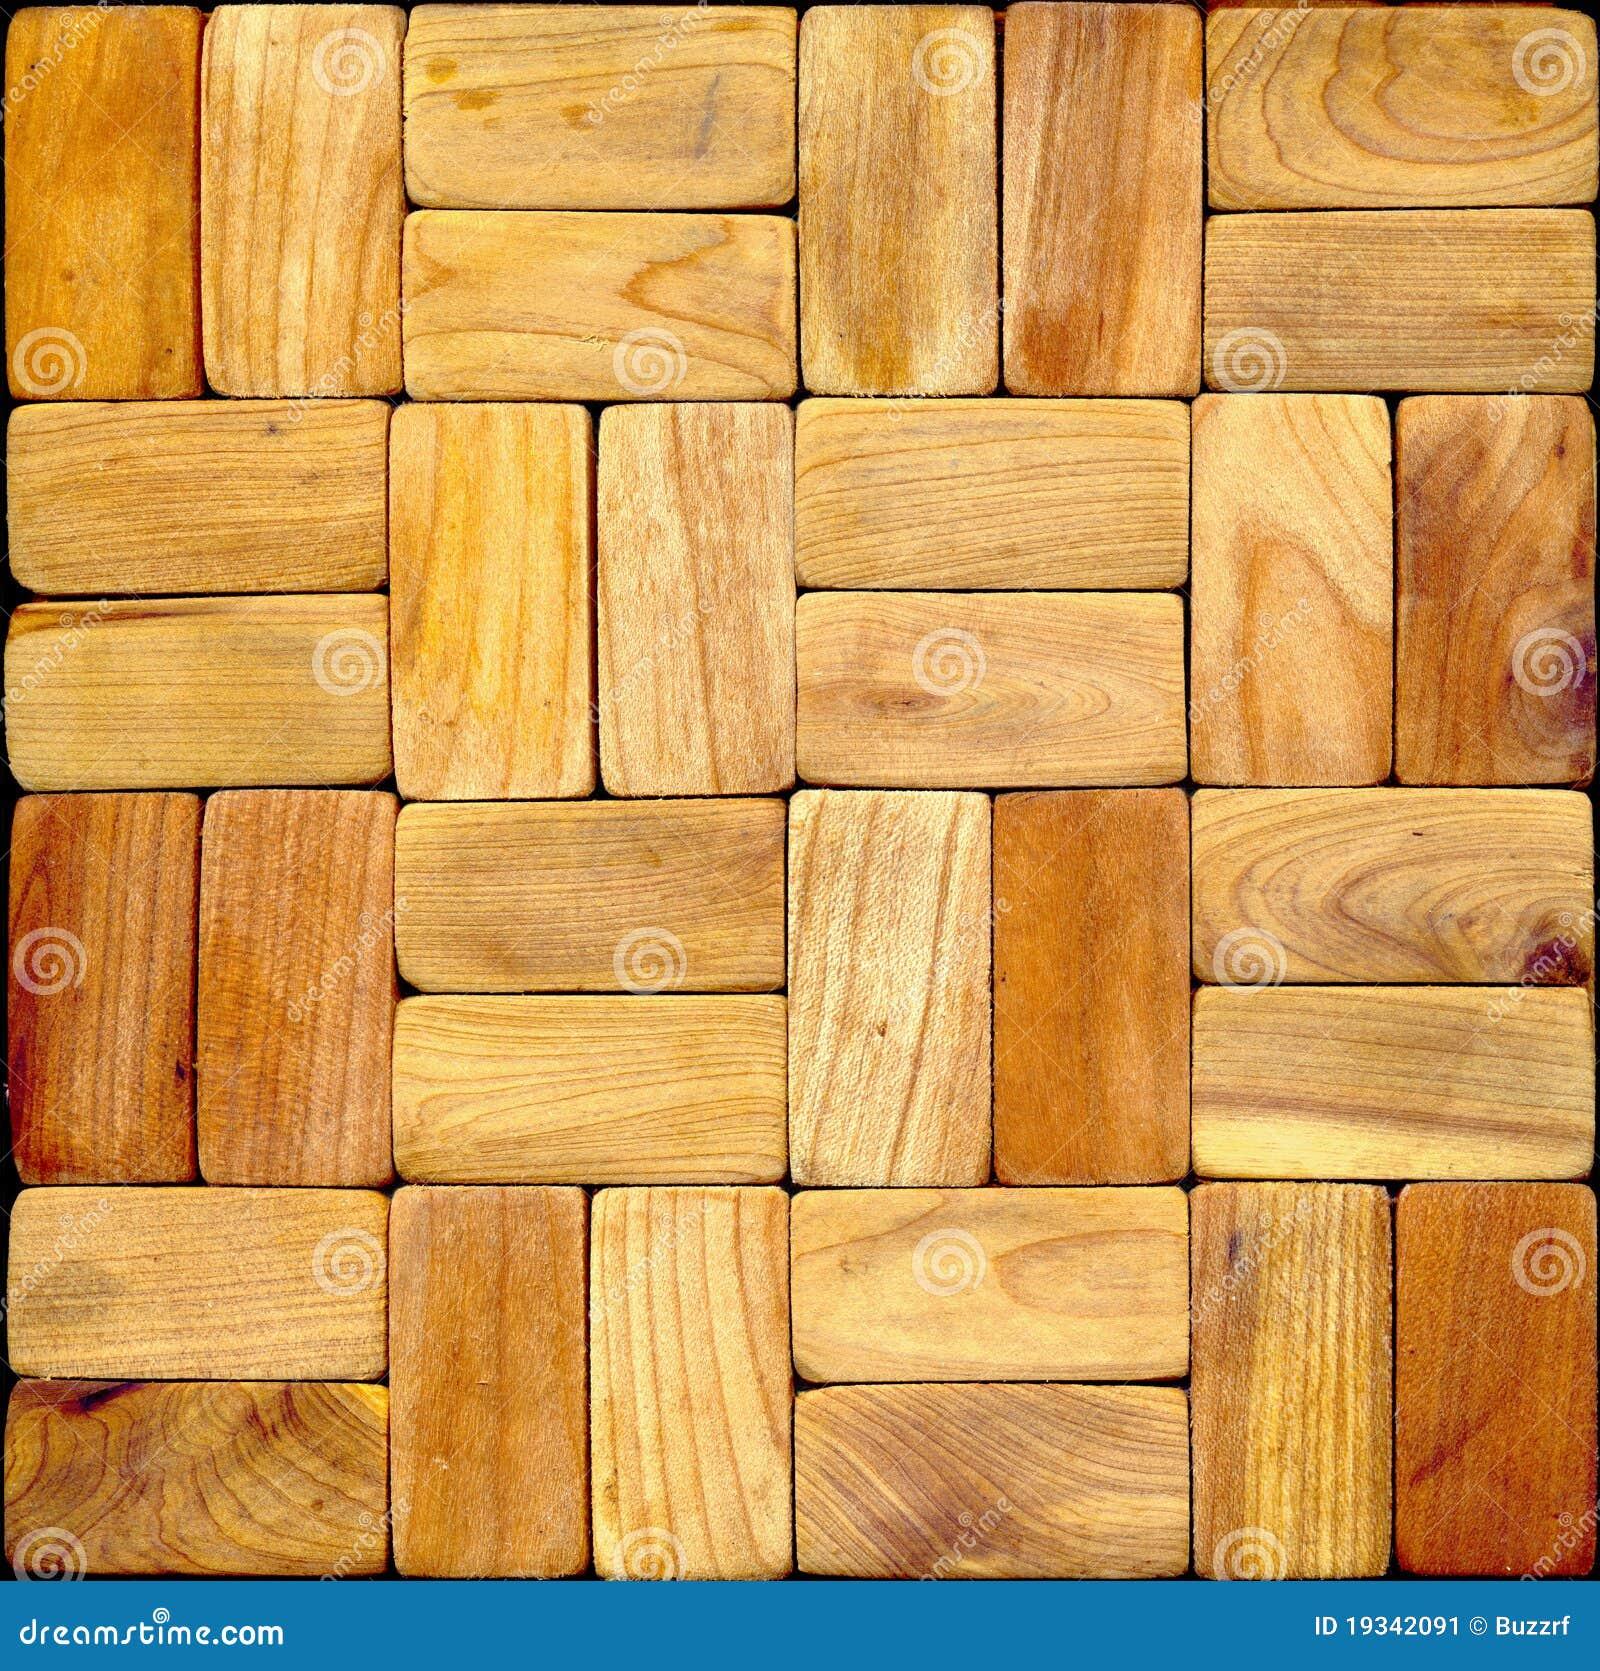 Basketball Floor Texture: Seamless Wood Texture Stock Image